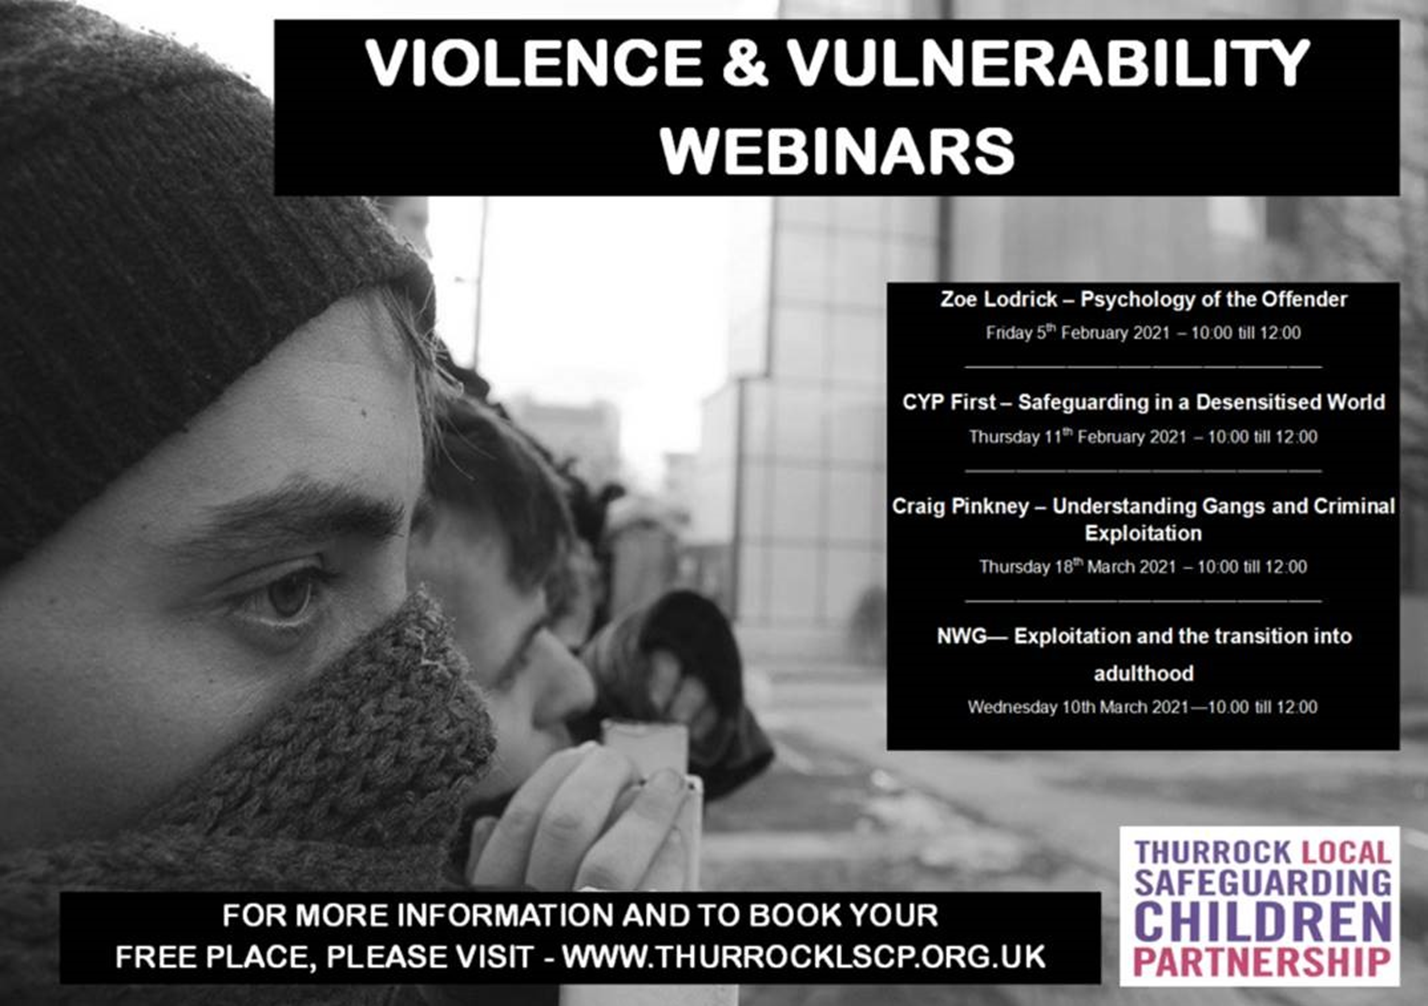 Image of Violence and Vulnerability webinars